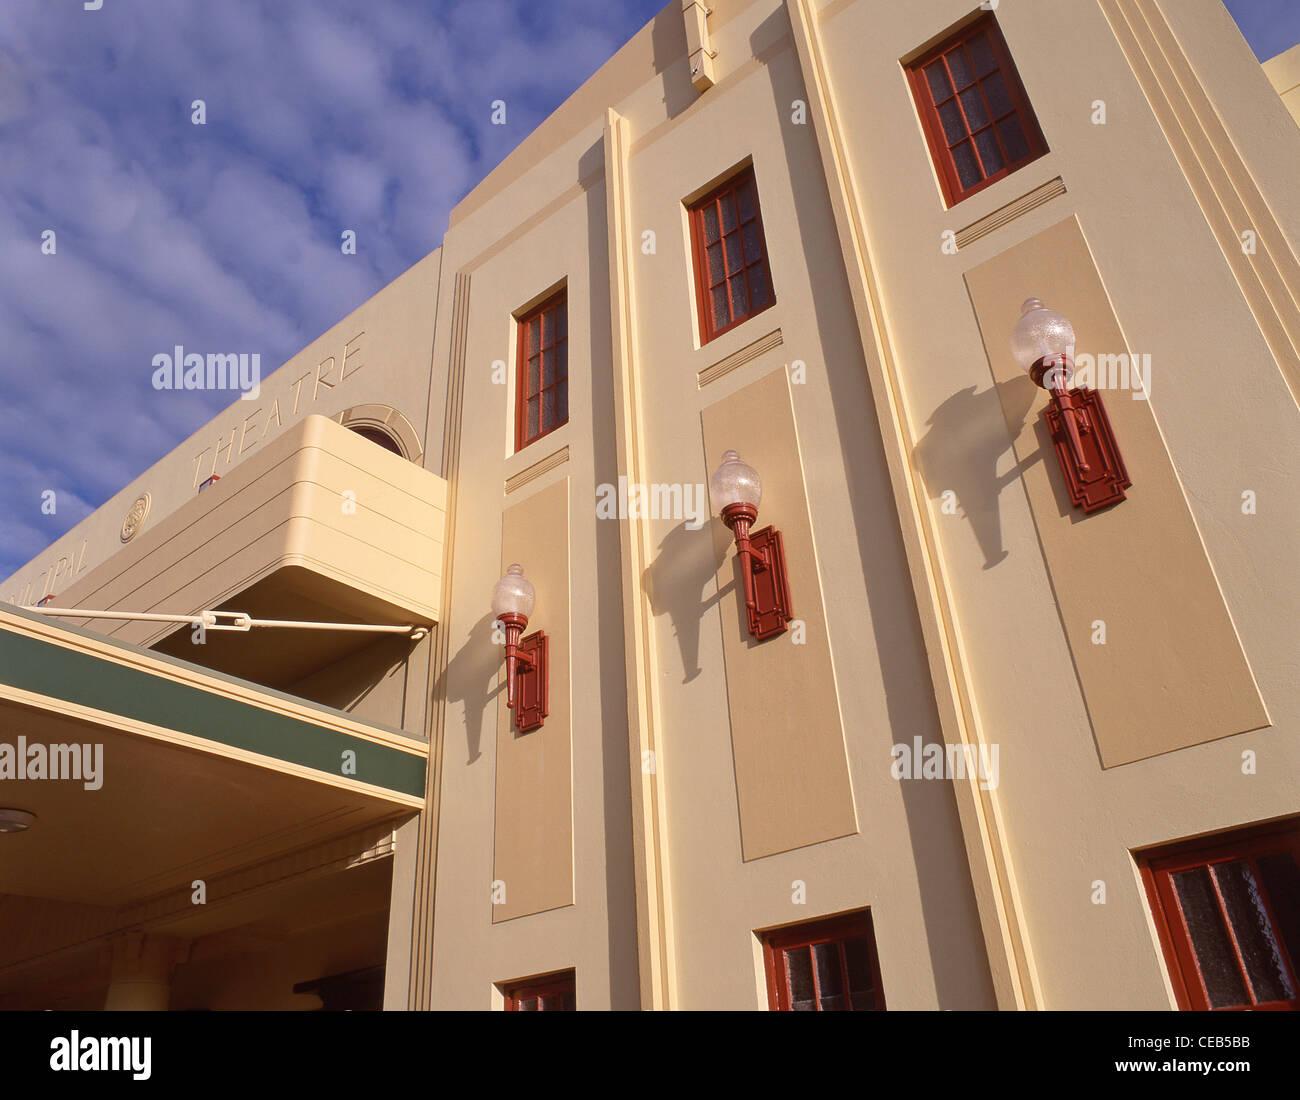 The Art Deco Municipal Theatre, Tennyson Street, Napier, Hawke's Bay, North Island, New Zealand - Stock Image